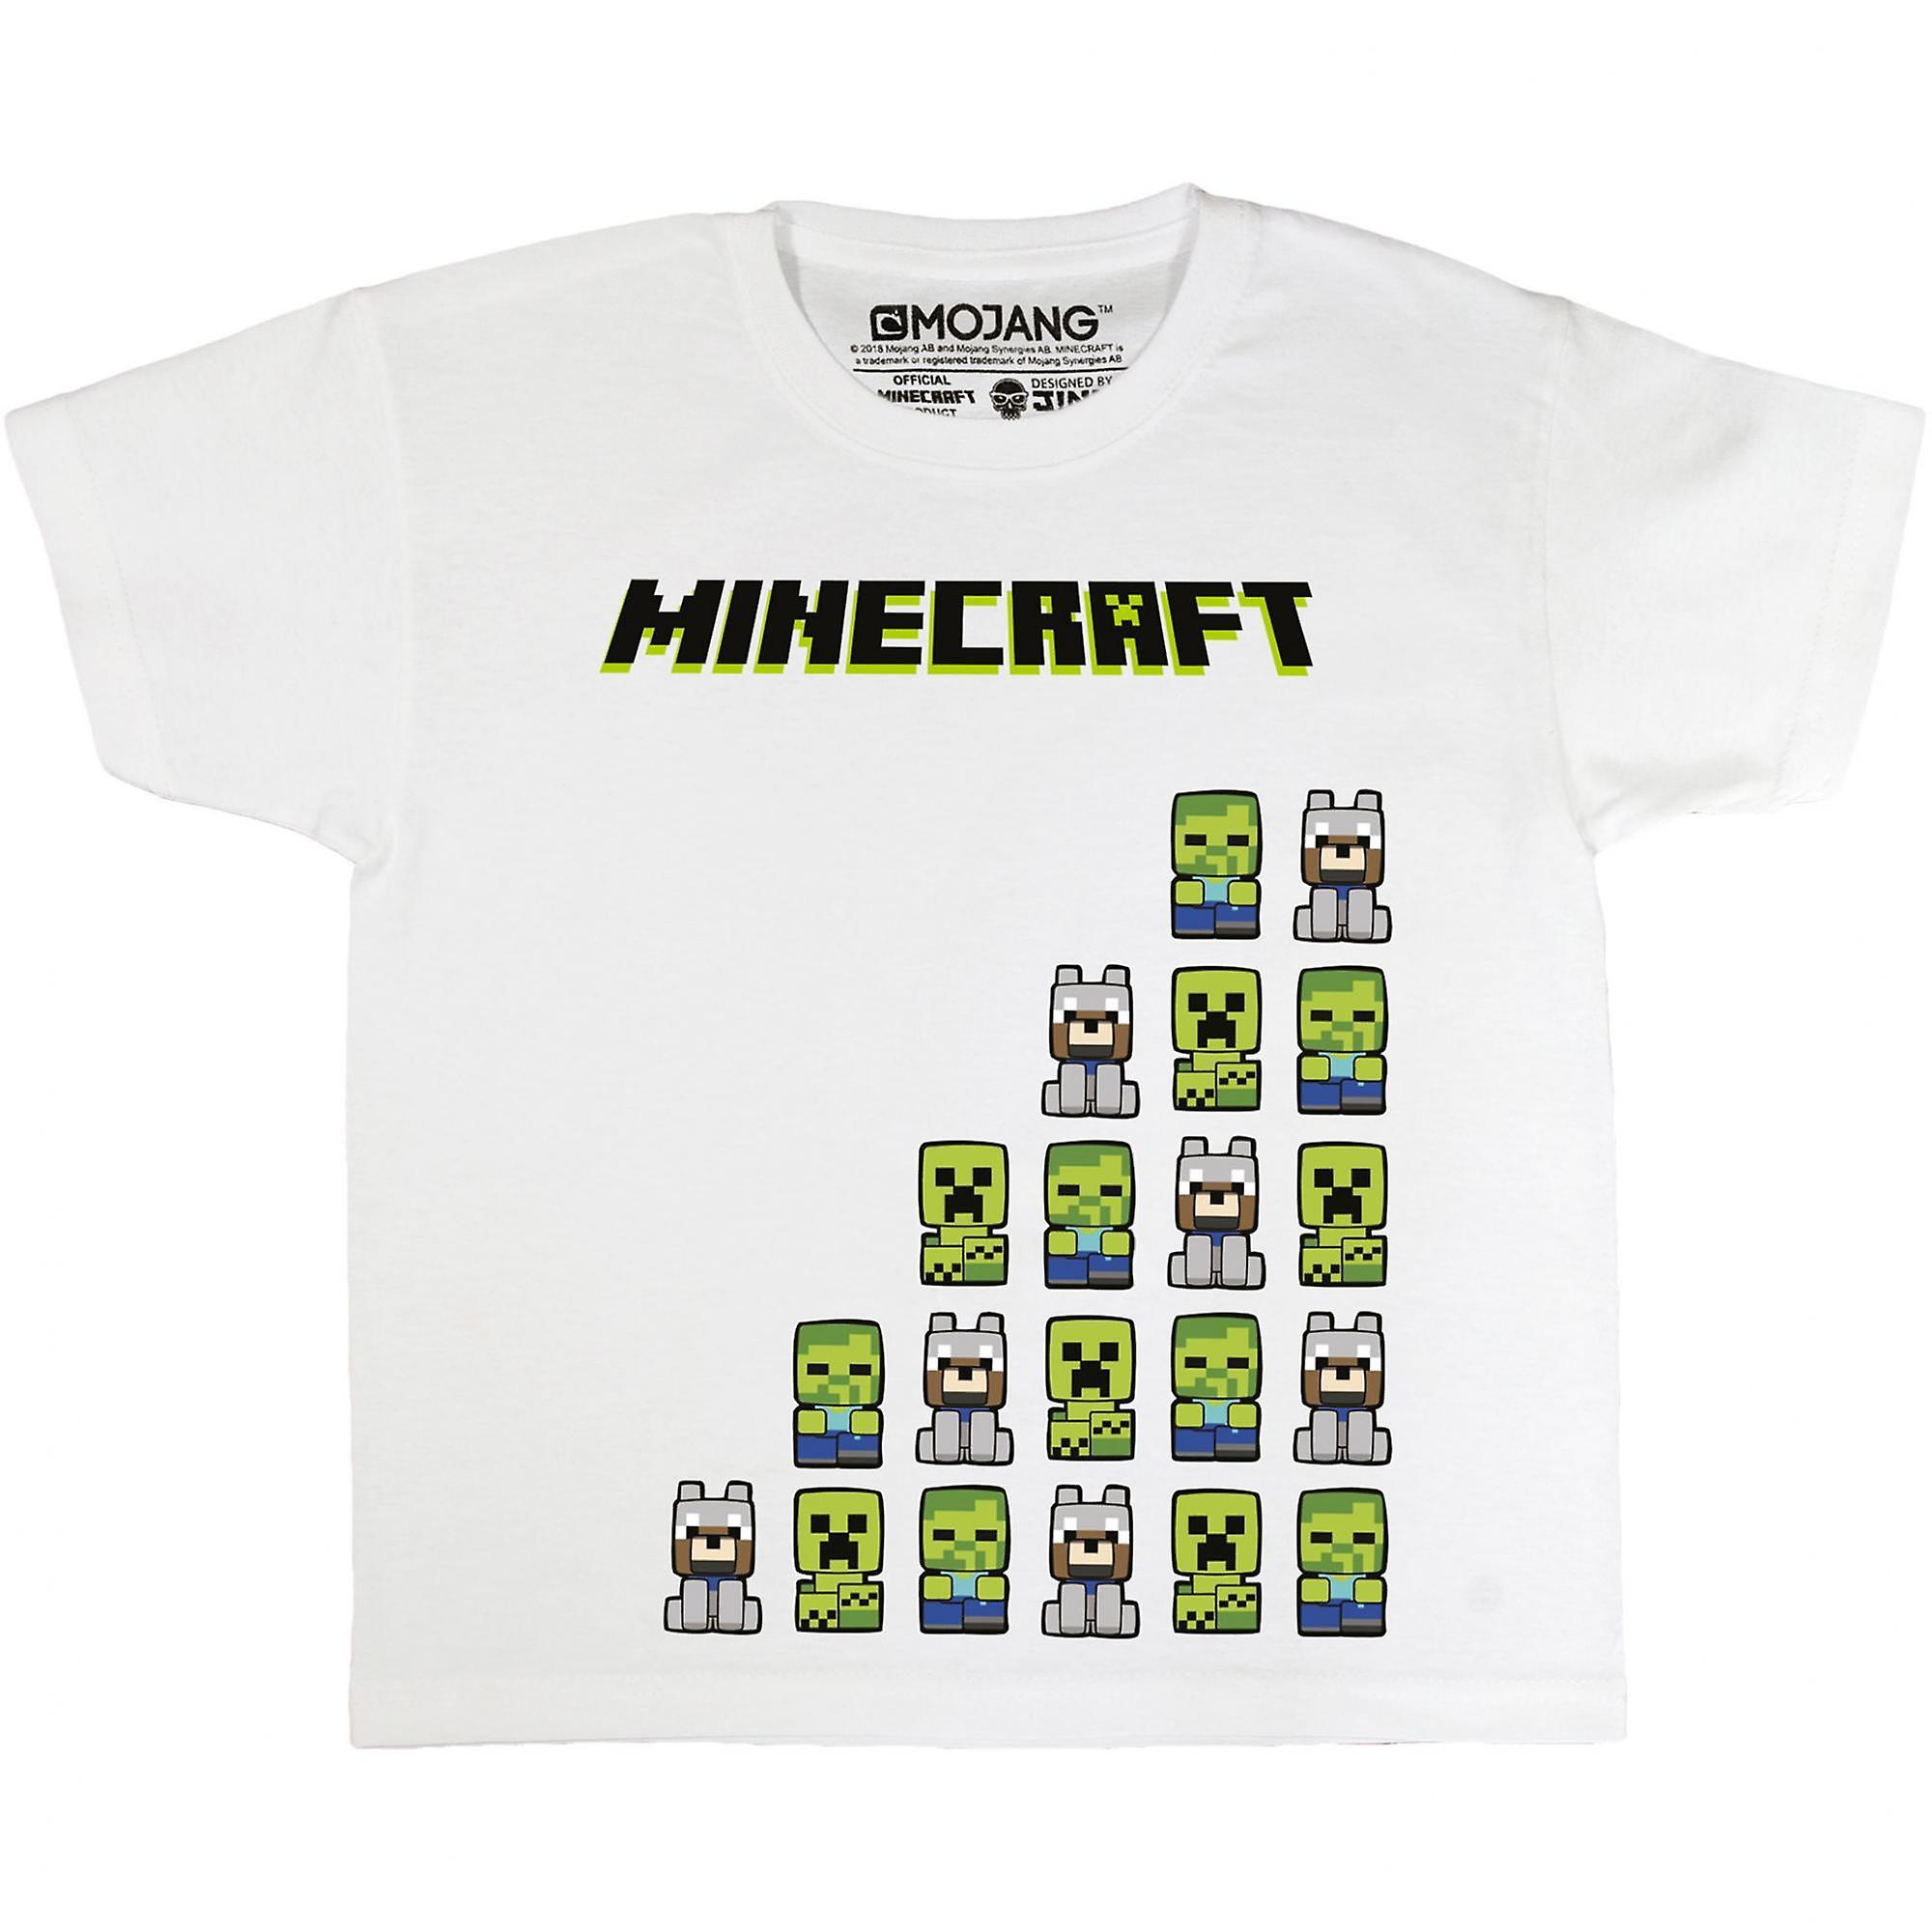 Minecraft Jungen meine Freunde T-Shirt   Fruugo DE